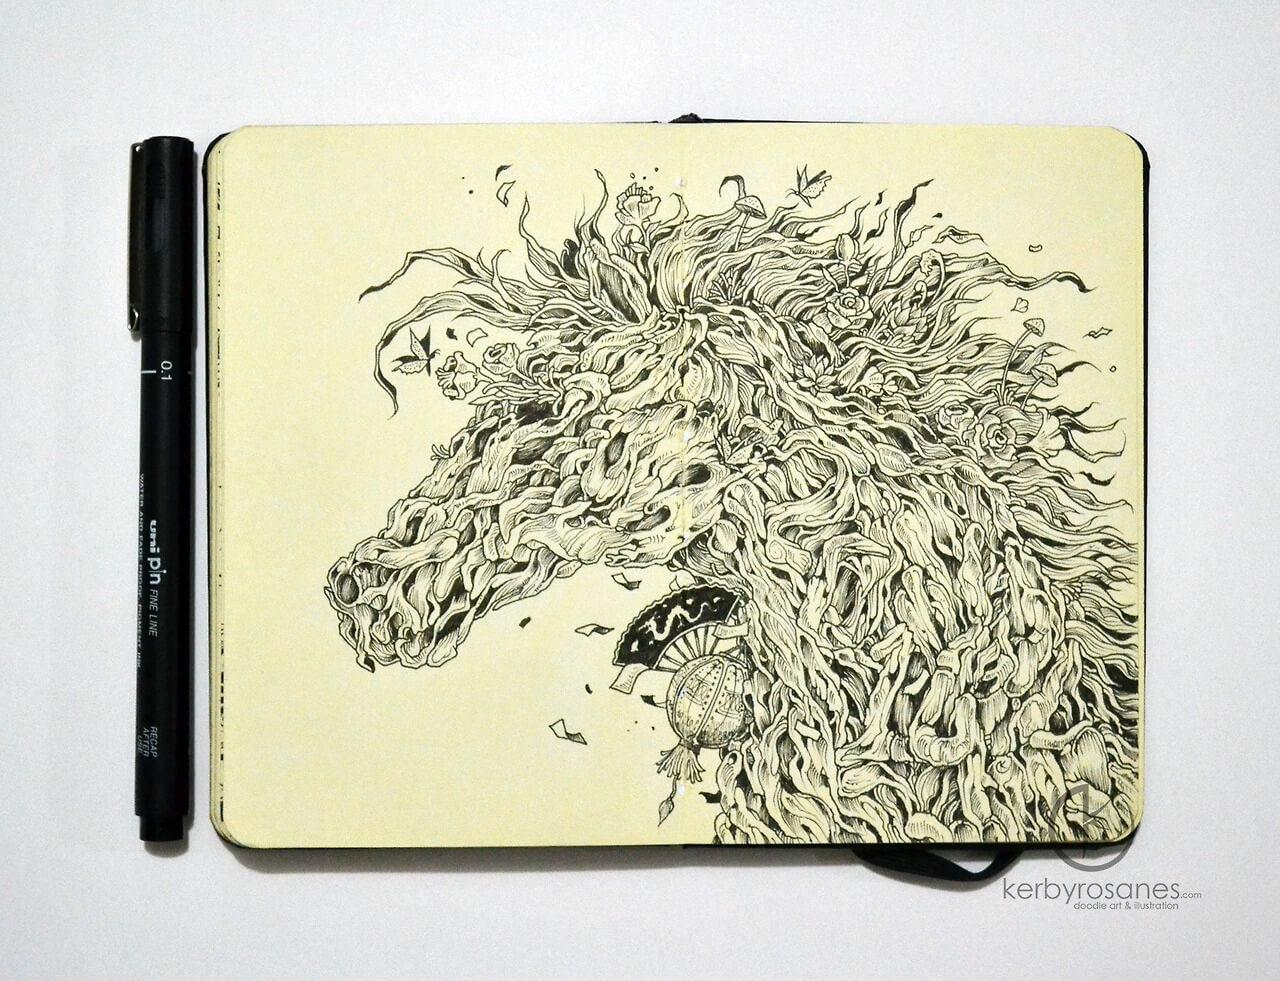 Kerby Rosane illustration 1